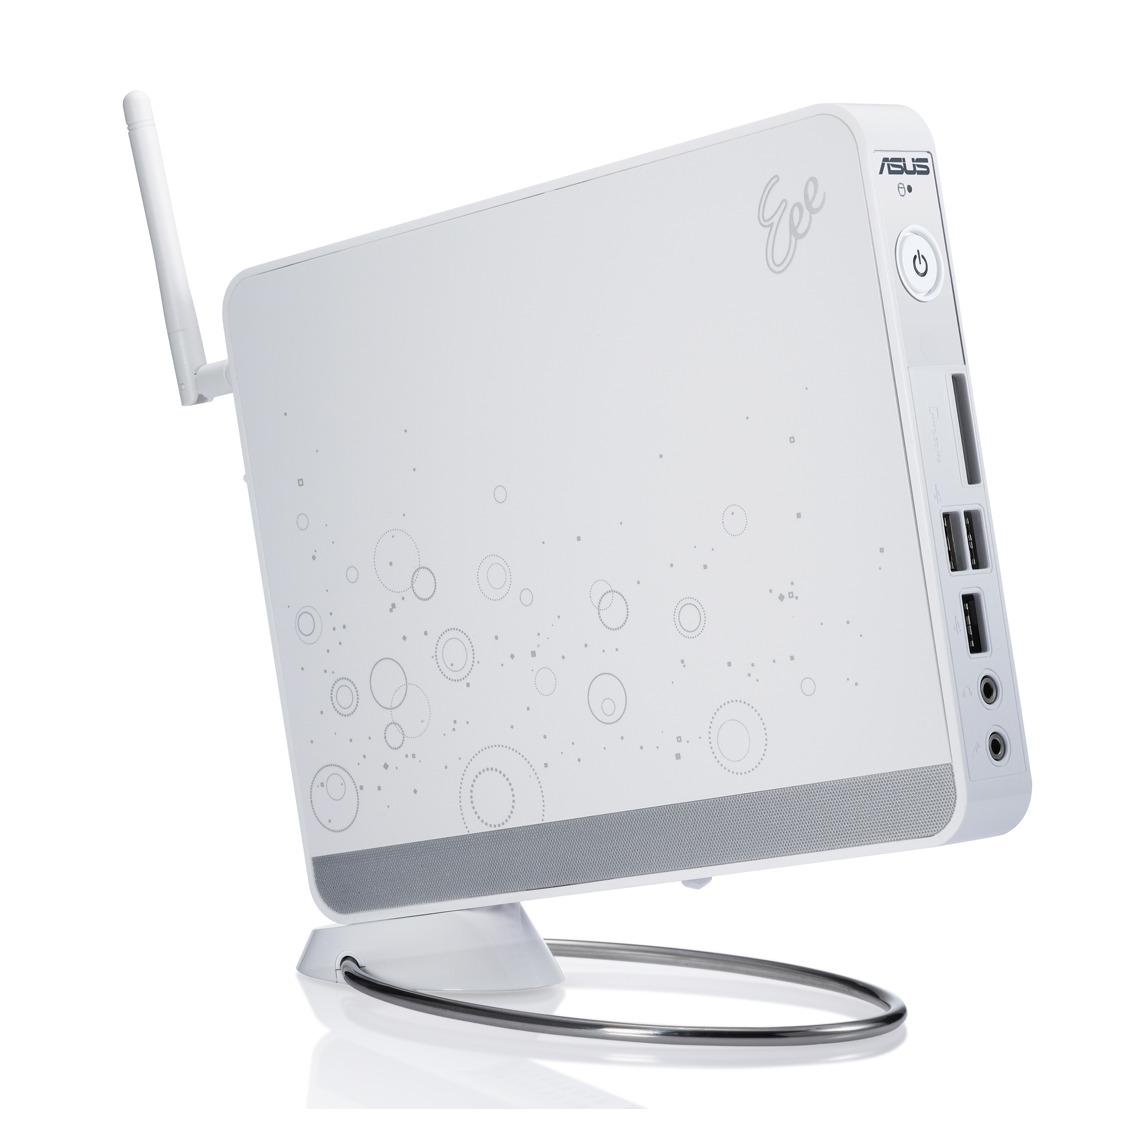 PC de bureau ASUS EeeBox PC EB1012 Blanc ASUS EeeBox PC EB1012 - Intel Atom Dual Core 330 2 Go 250 Go NVIDIA ION Wi-Fi N Windows 7 Premium (coloris blanc)